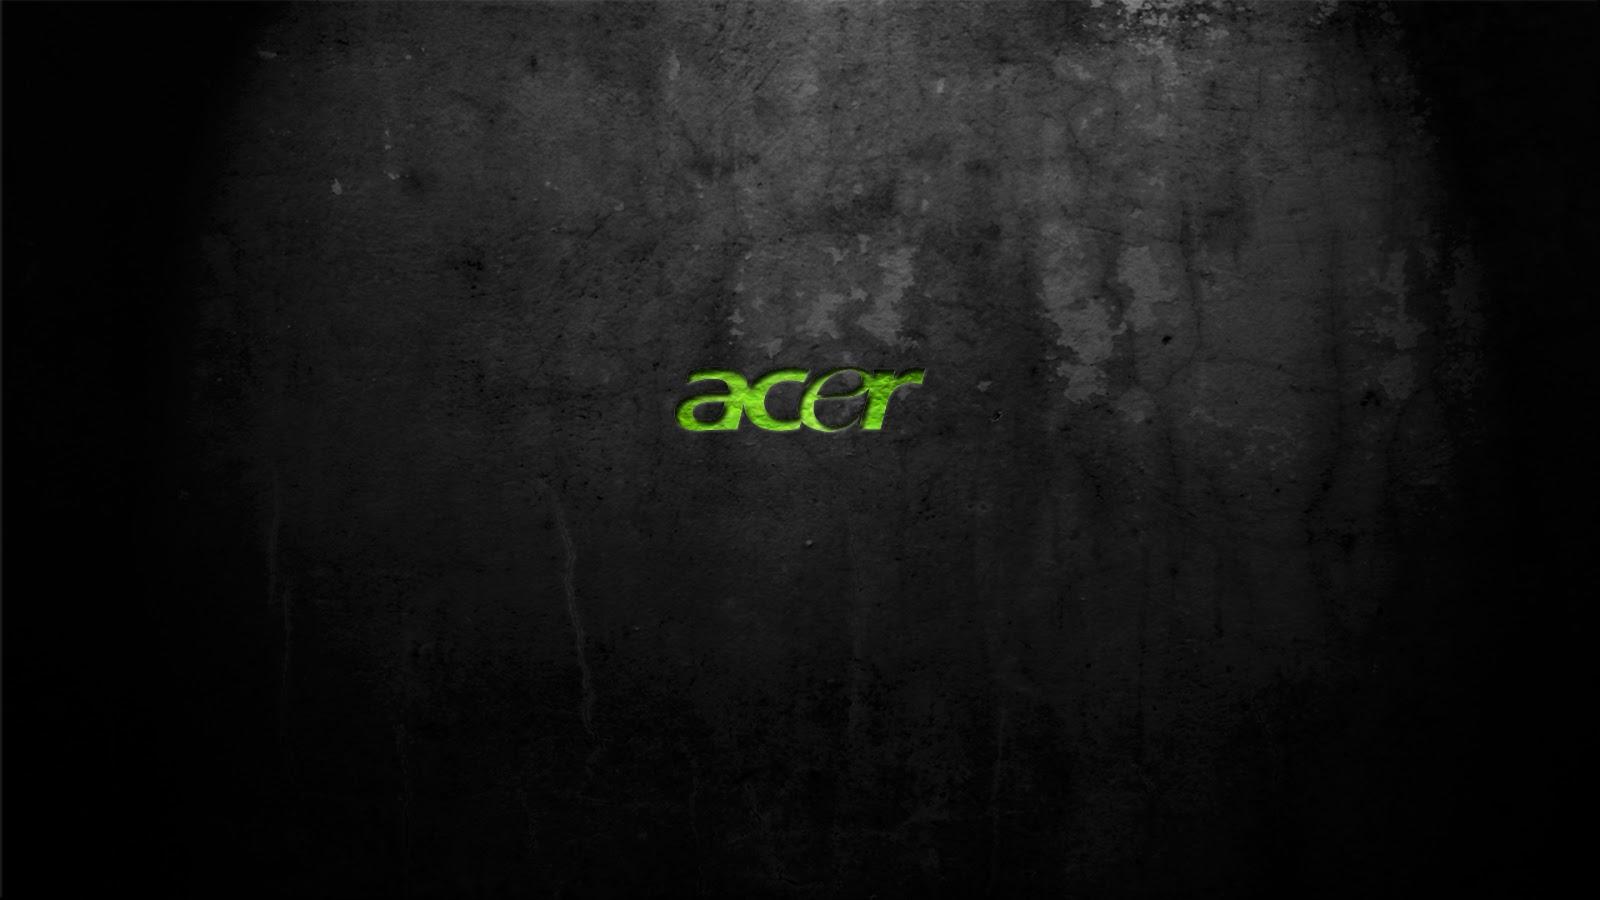 Acer Logo Computer HD Wallpaper Dark Backgroundjpg 1600x900